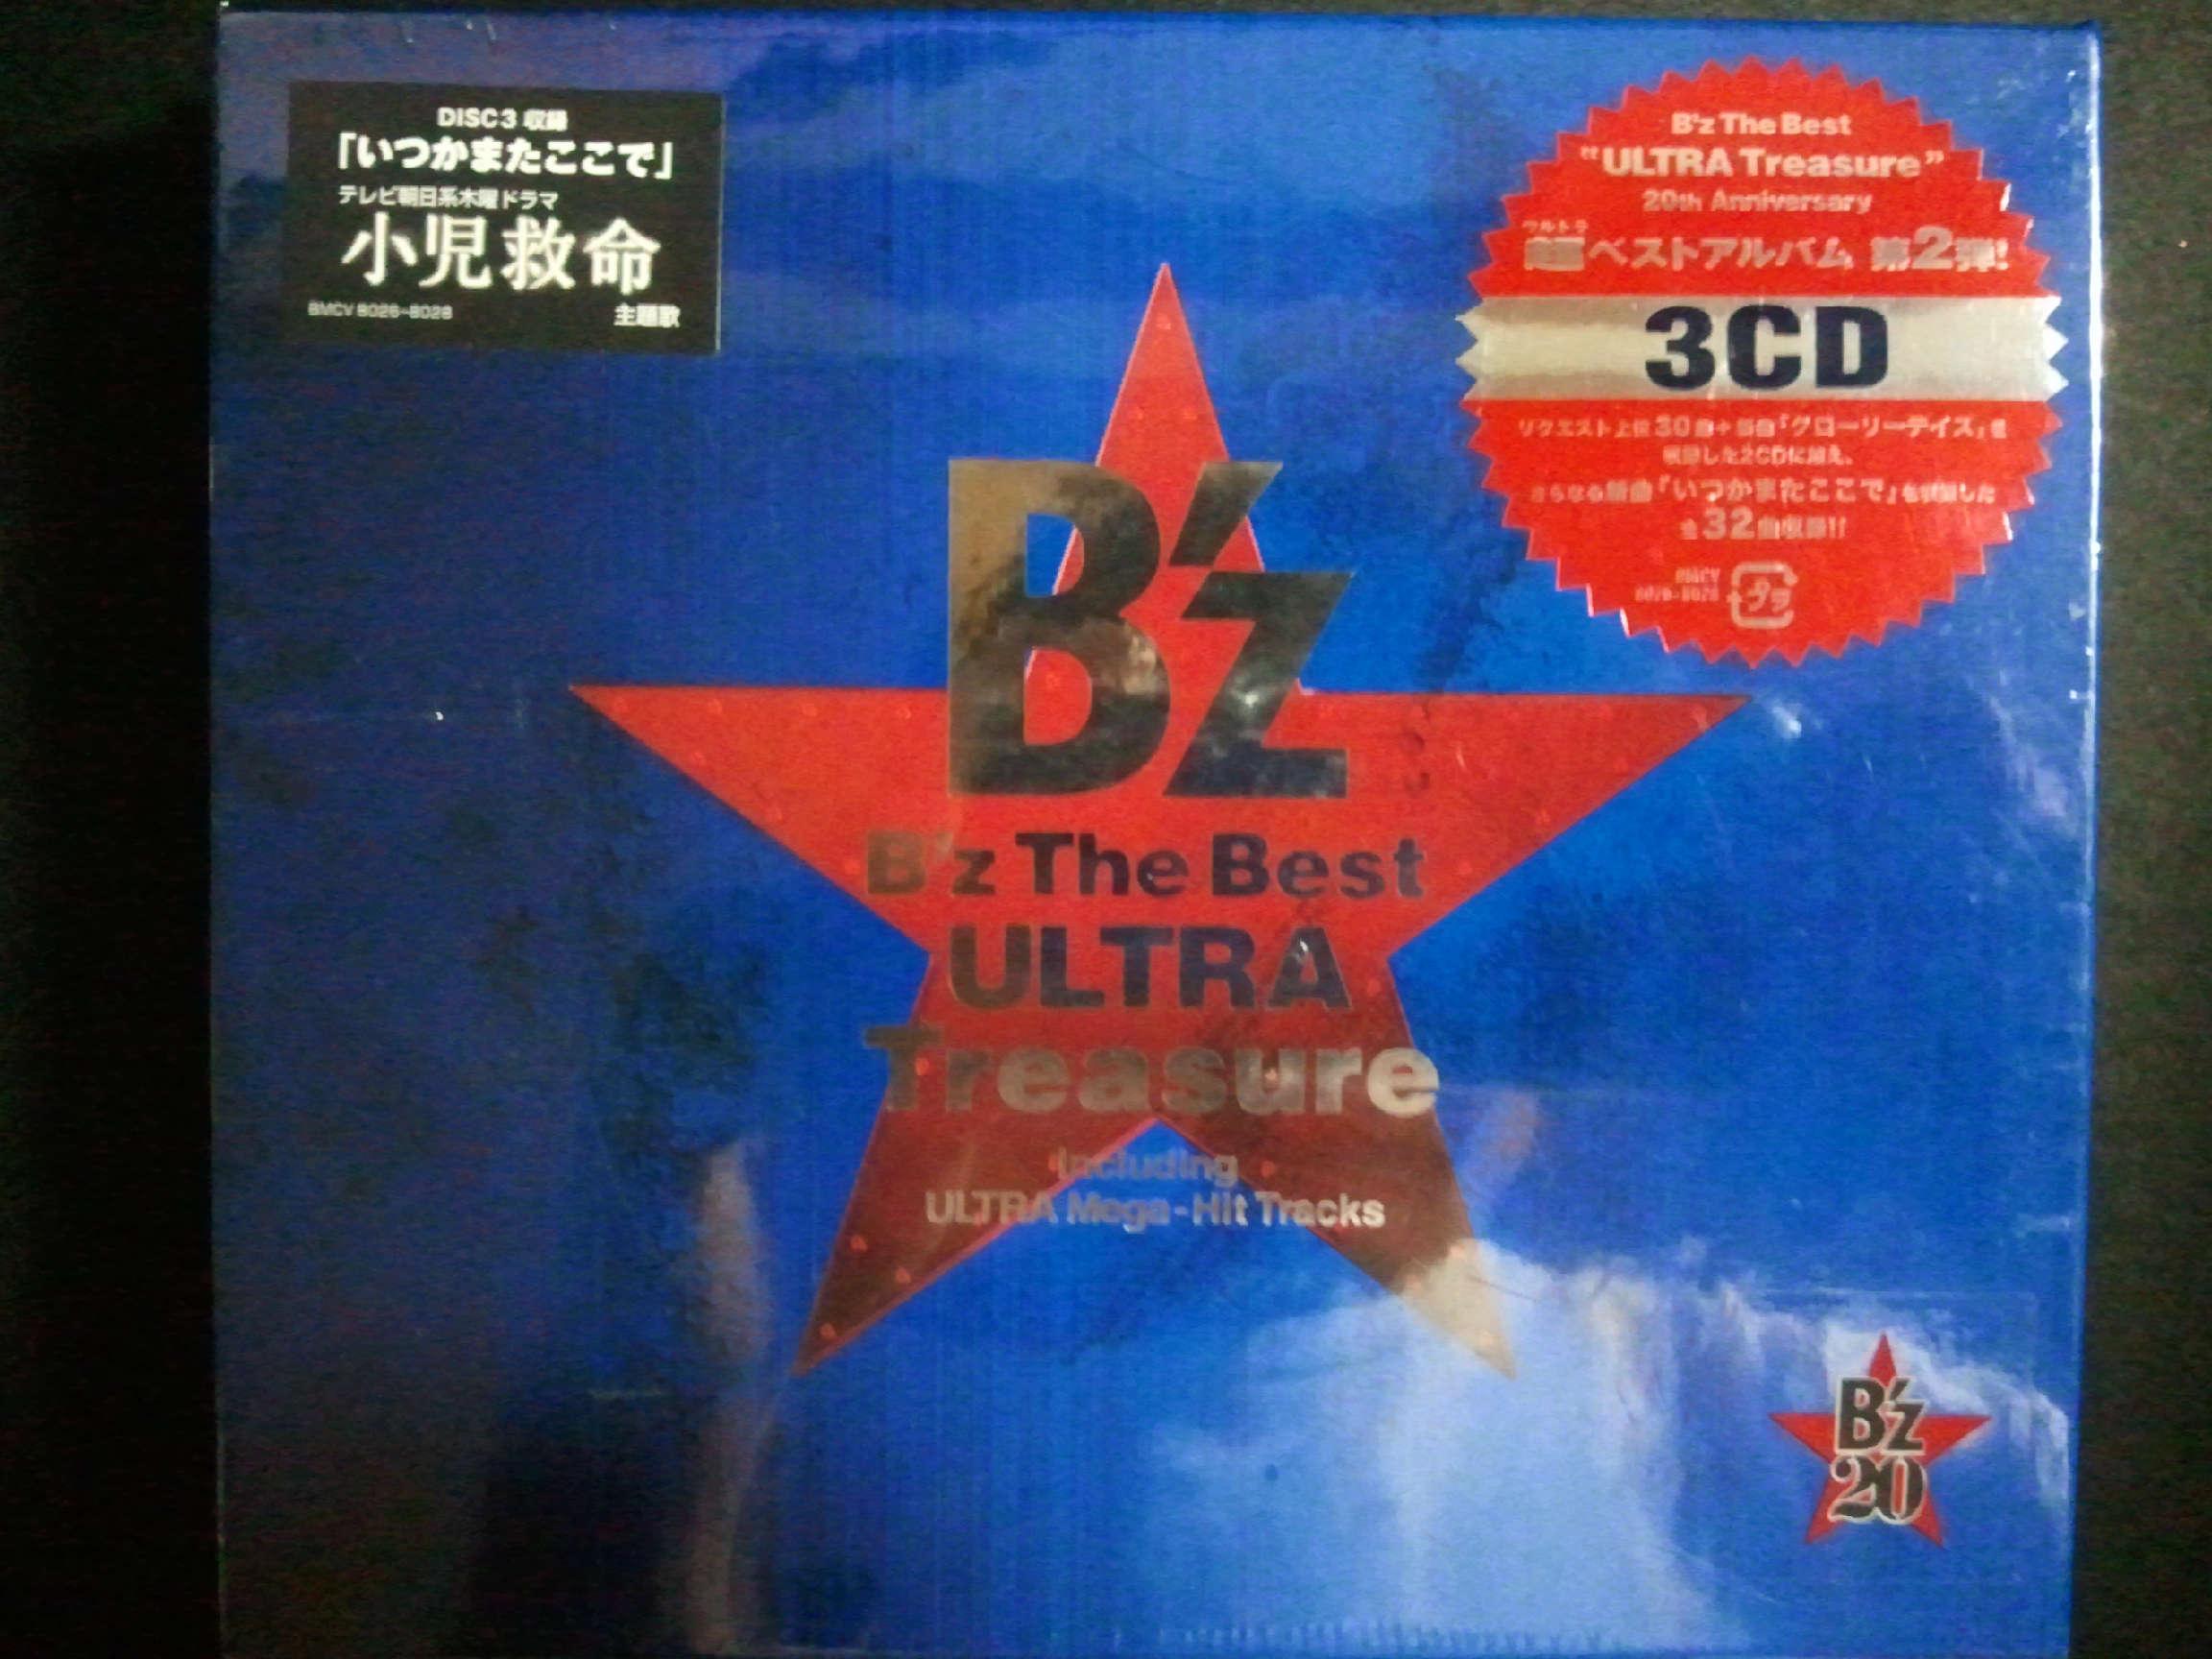 B'z The Best ULTRA Treasure